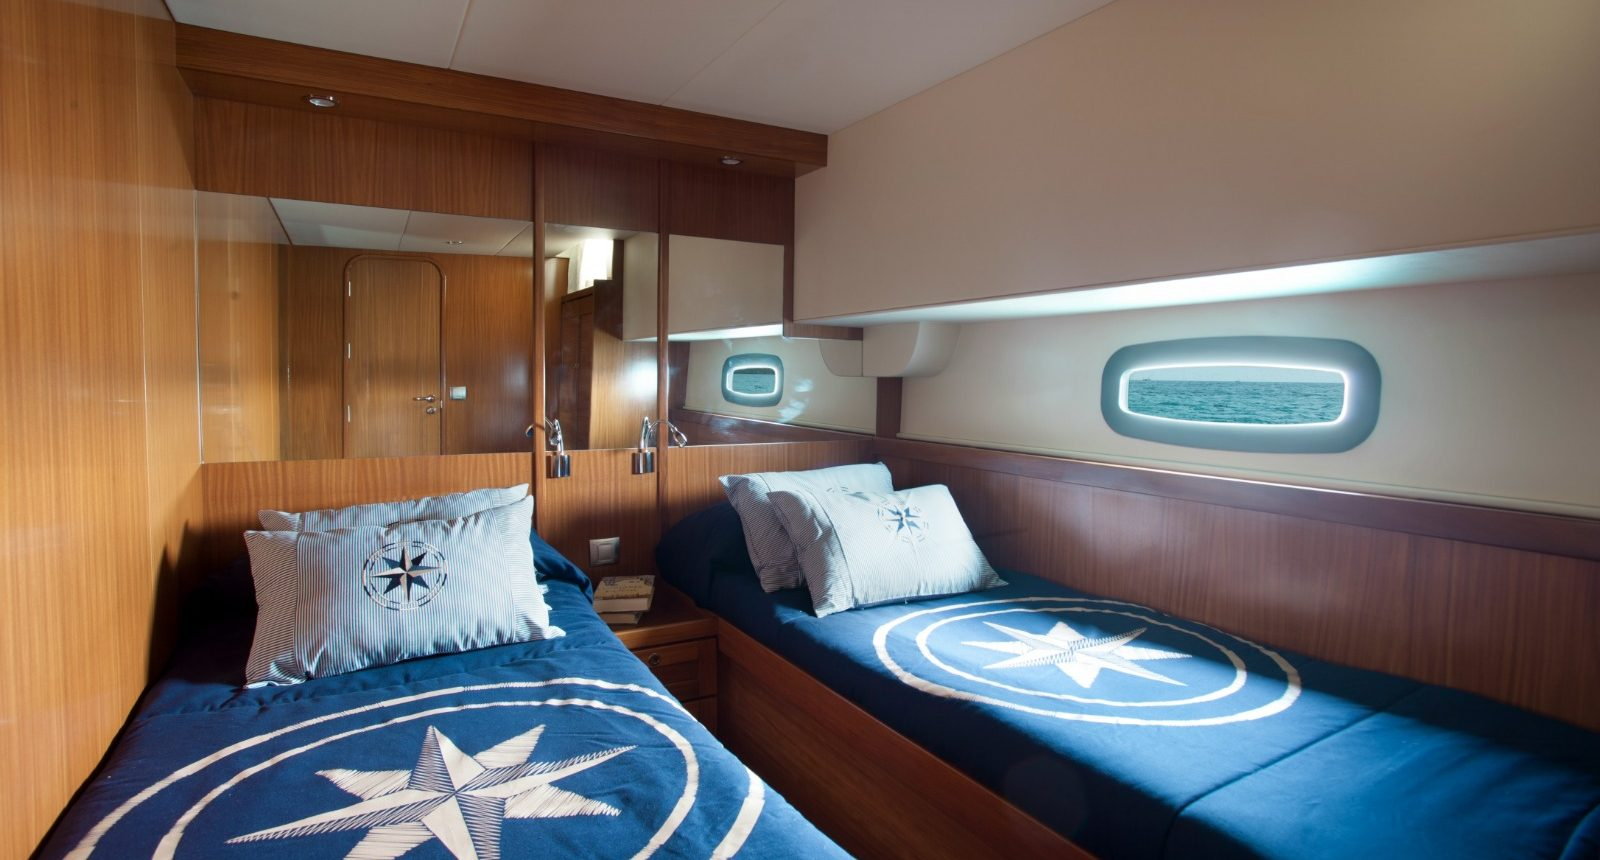 Minorca Islander 54 Flybridge - guest cabin